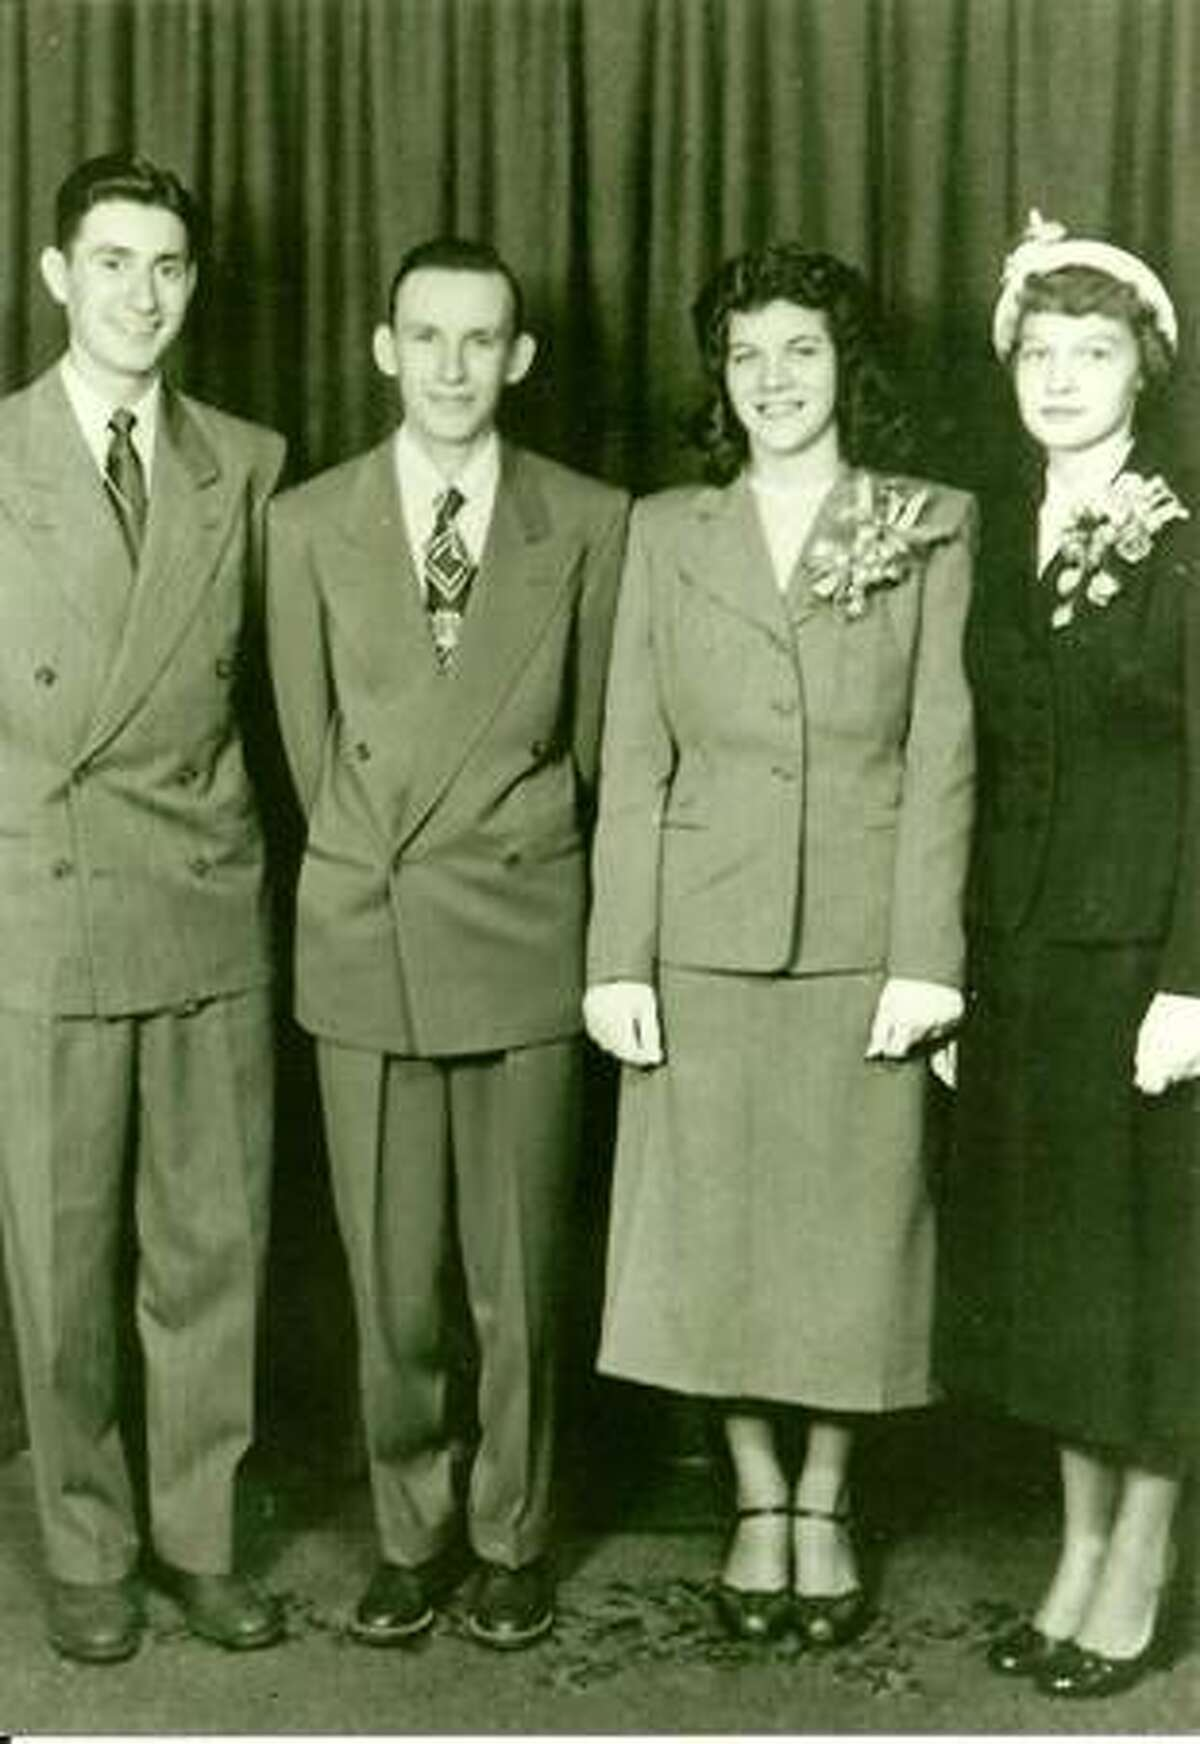 From left, Robert Landolt, best man; Don and Pat Hastings; bridesmaid Ellen Bucheim.